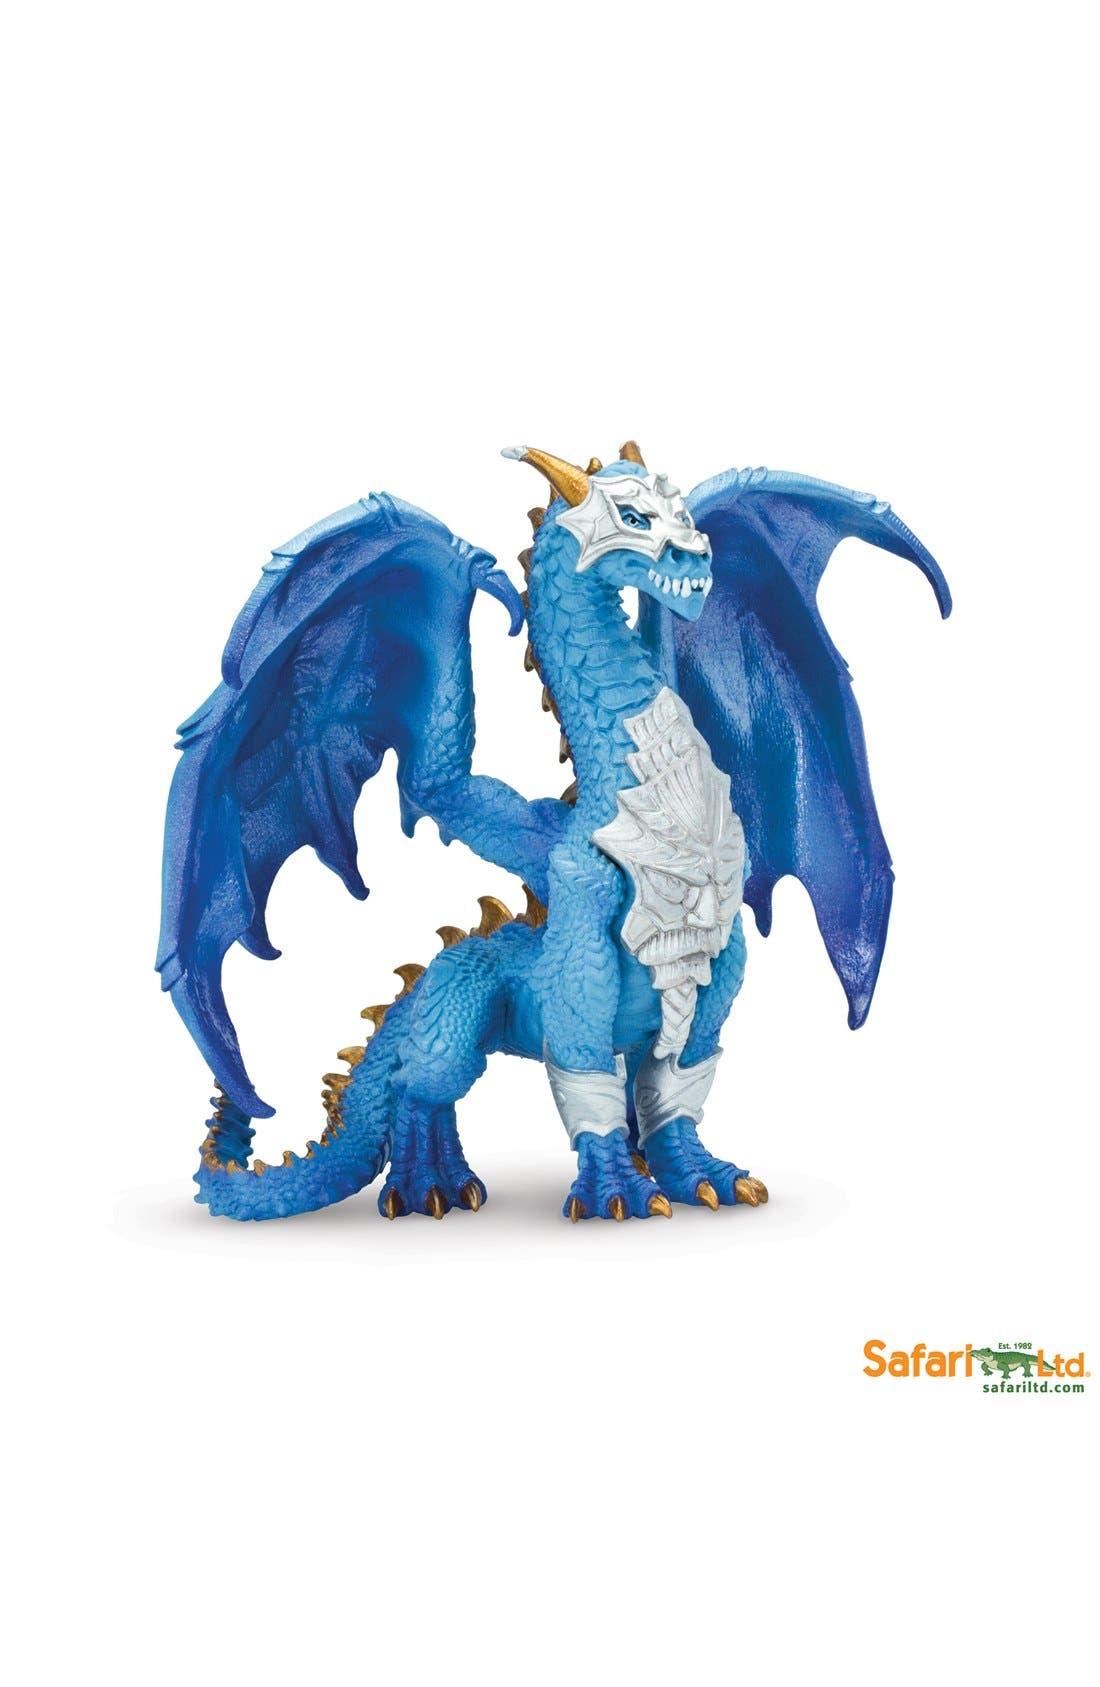 Safari Ltd. Guardian Dragon Figurine